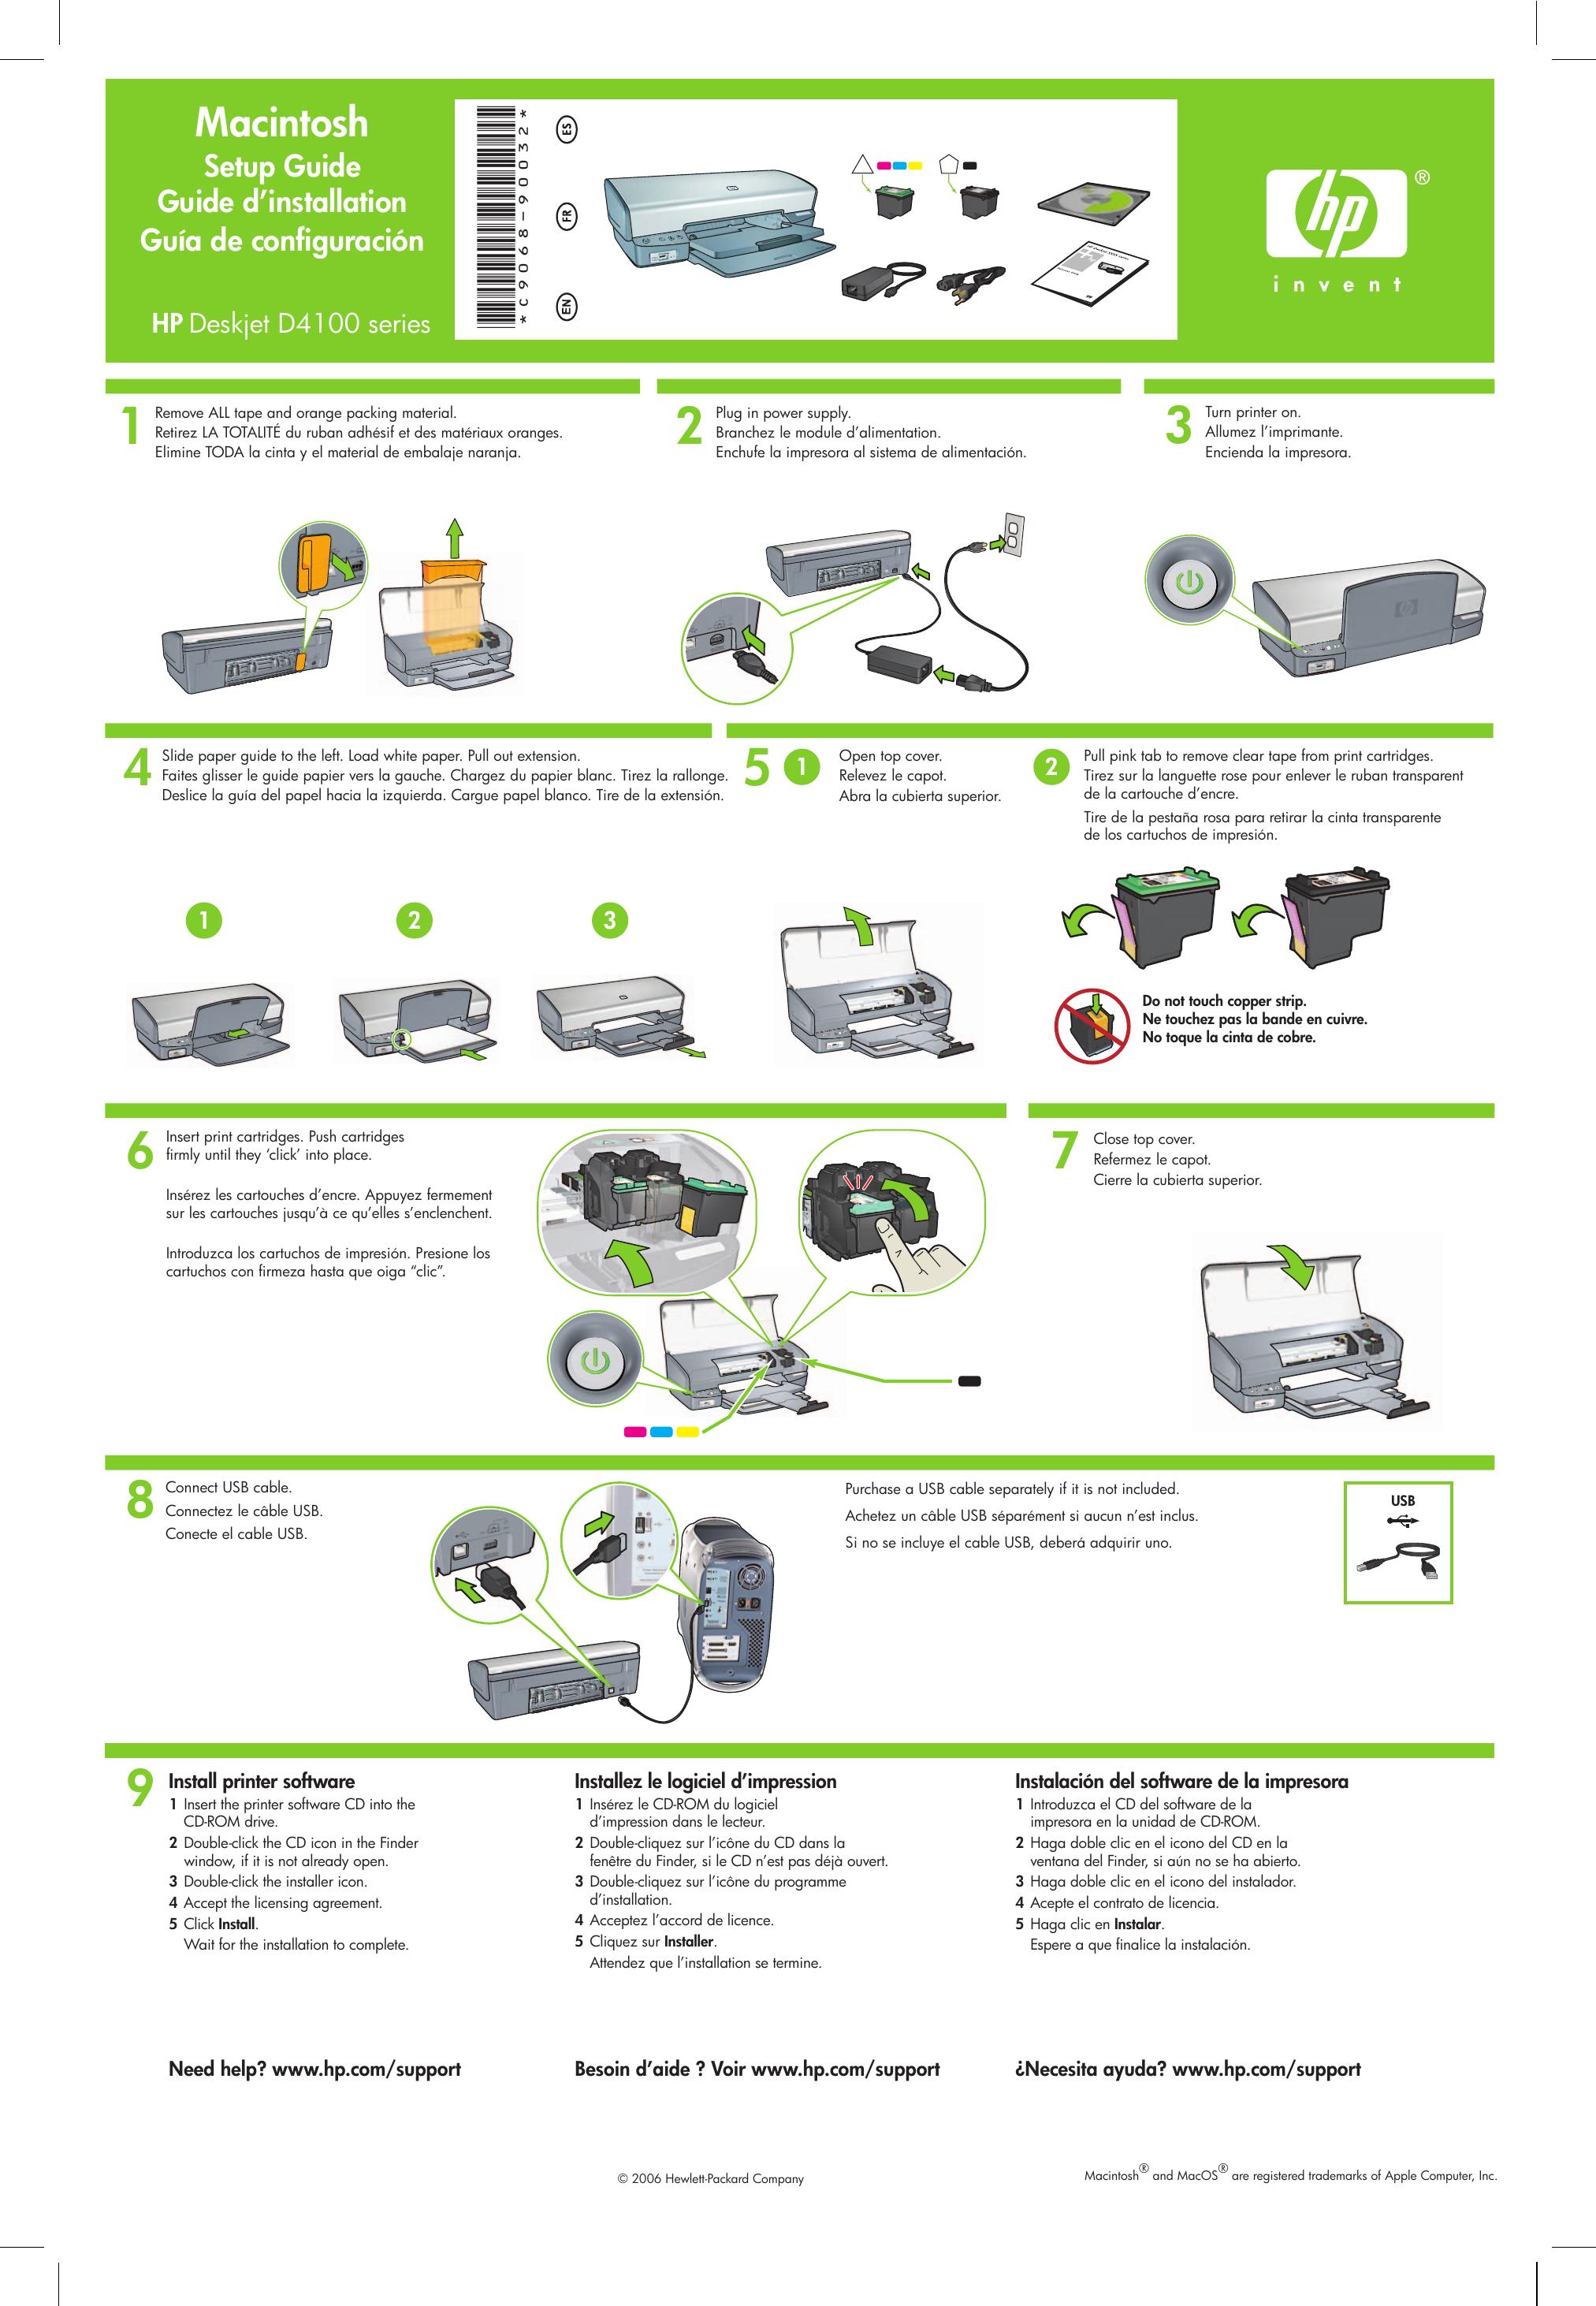 hp deskjet d4100 users manual c9068 90032 en fr es print rh usermanual wiki 18 HP Vanguard Manual HP Manuals PDF